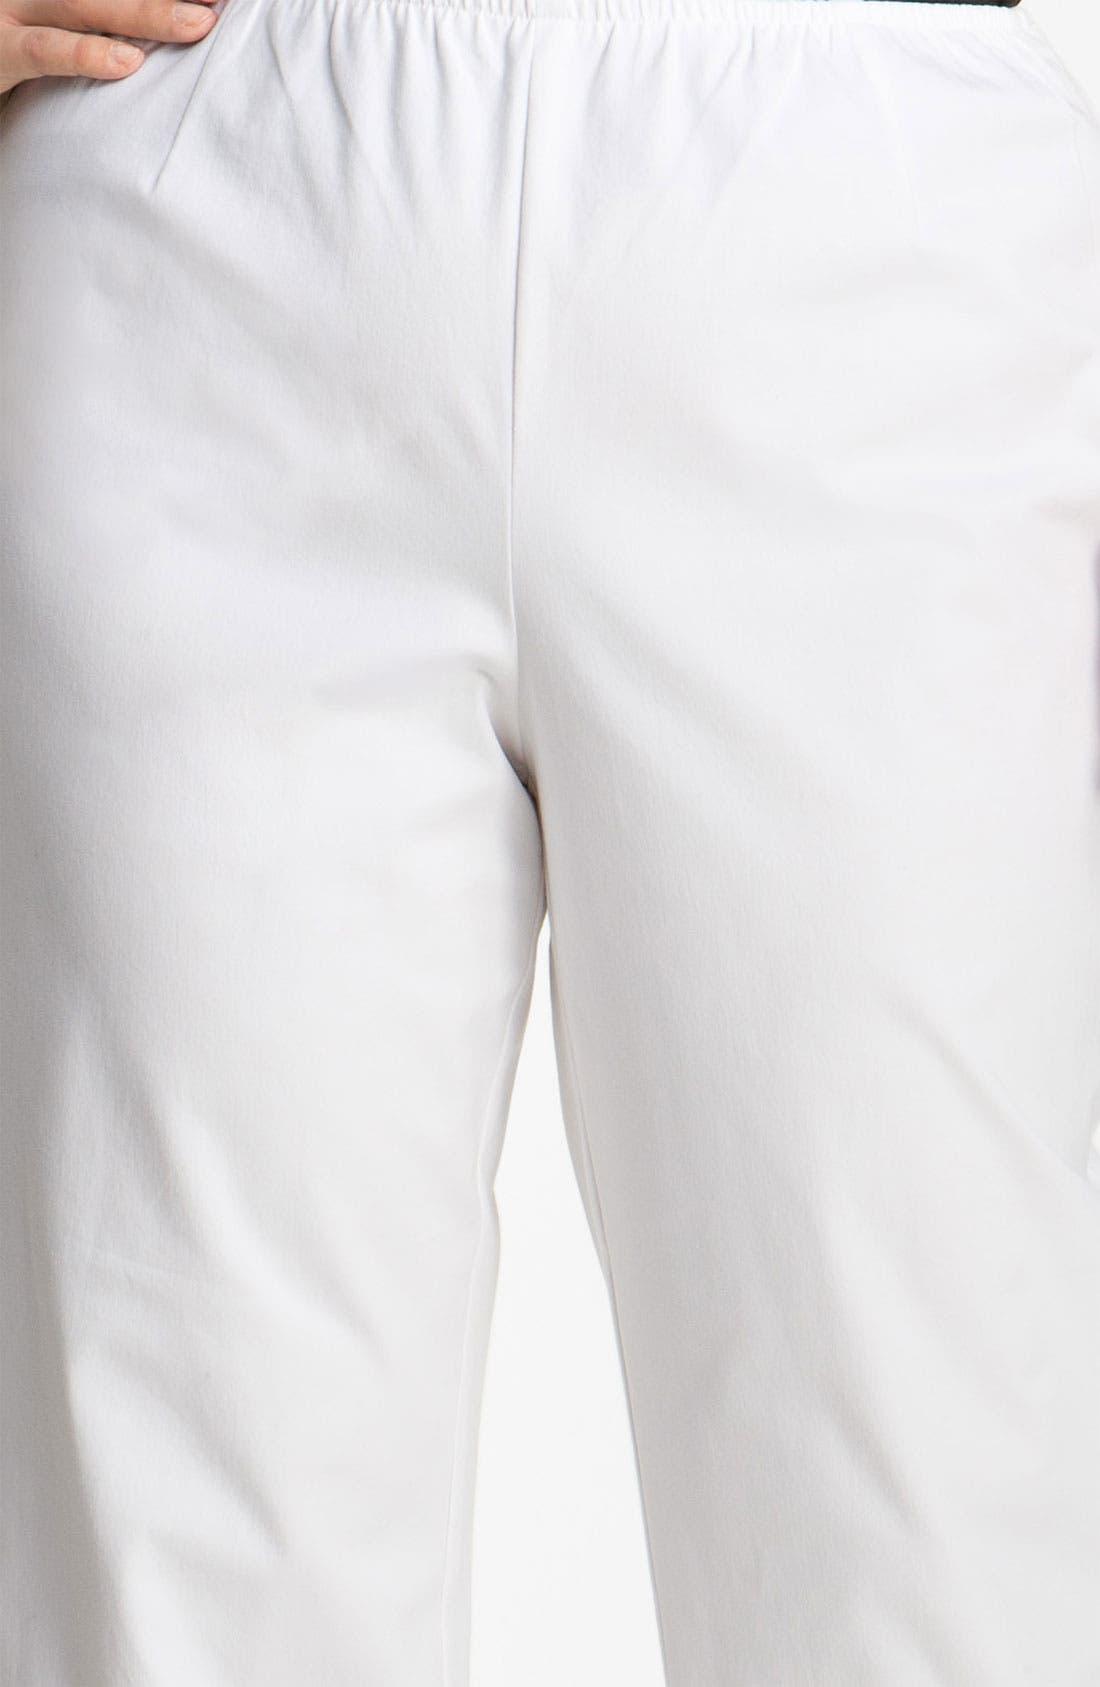 Stretch Organic Cotton Ankle Pants,                             Alternate thumbnail 3, color,                             White